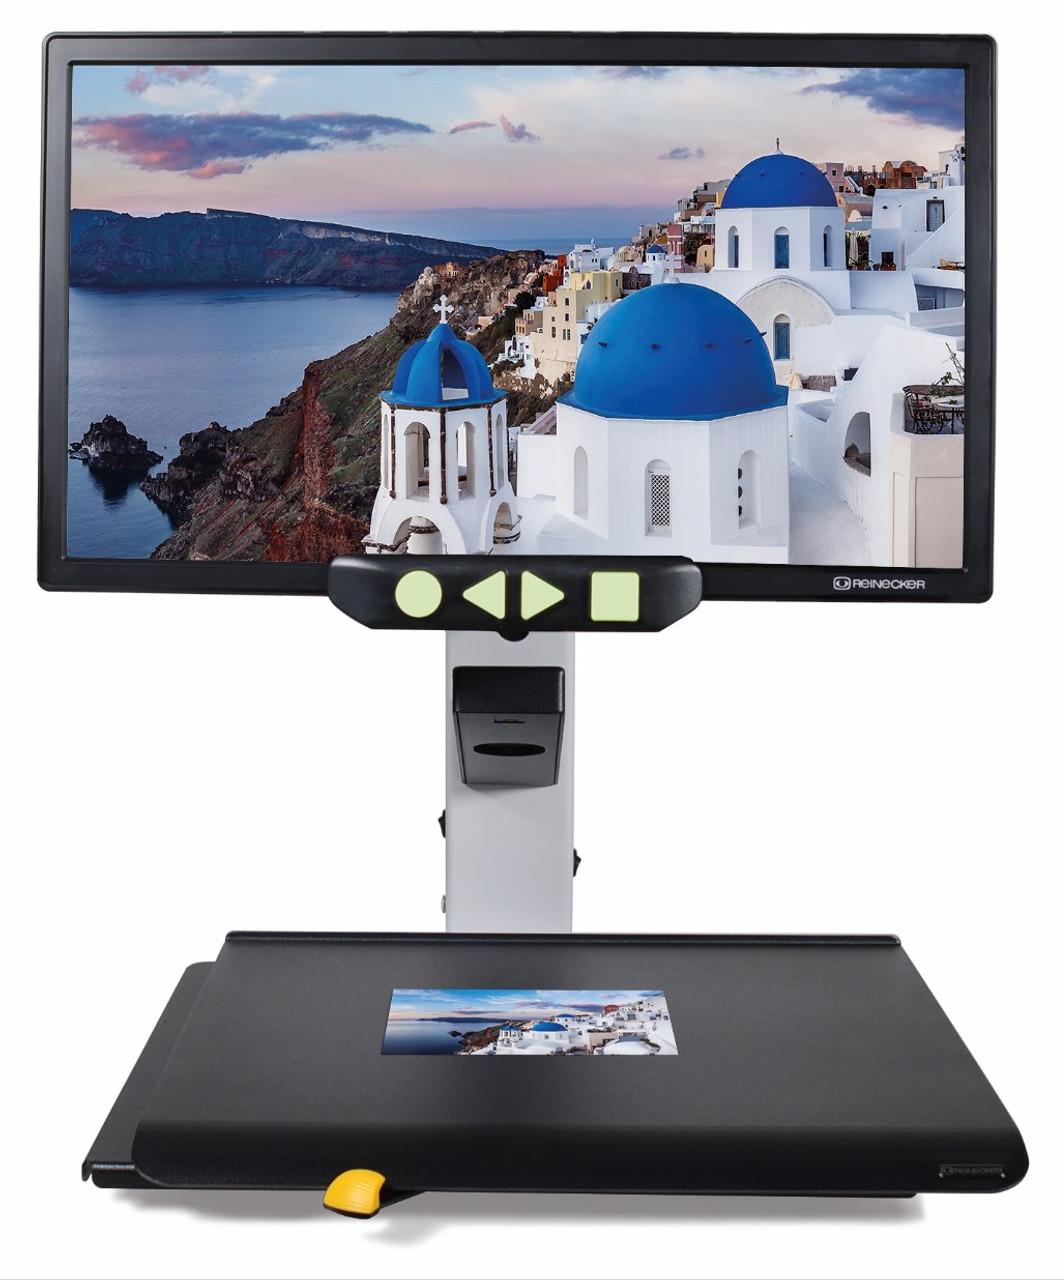 "Reinecker Videomatic 20"" Low Vision CCTV"